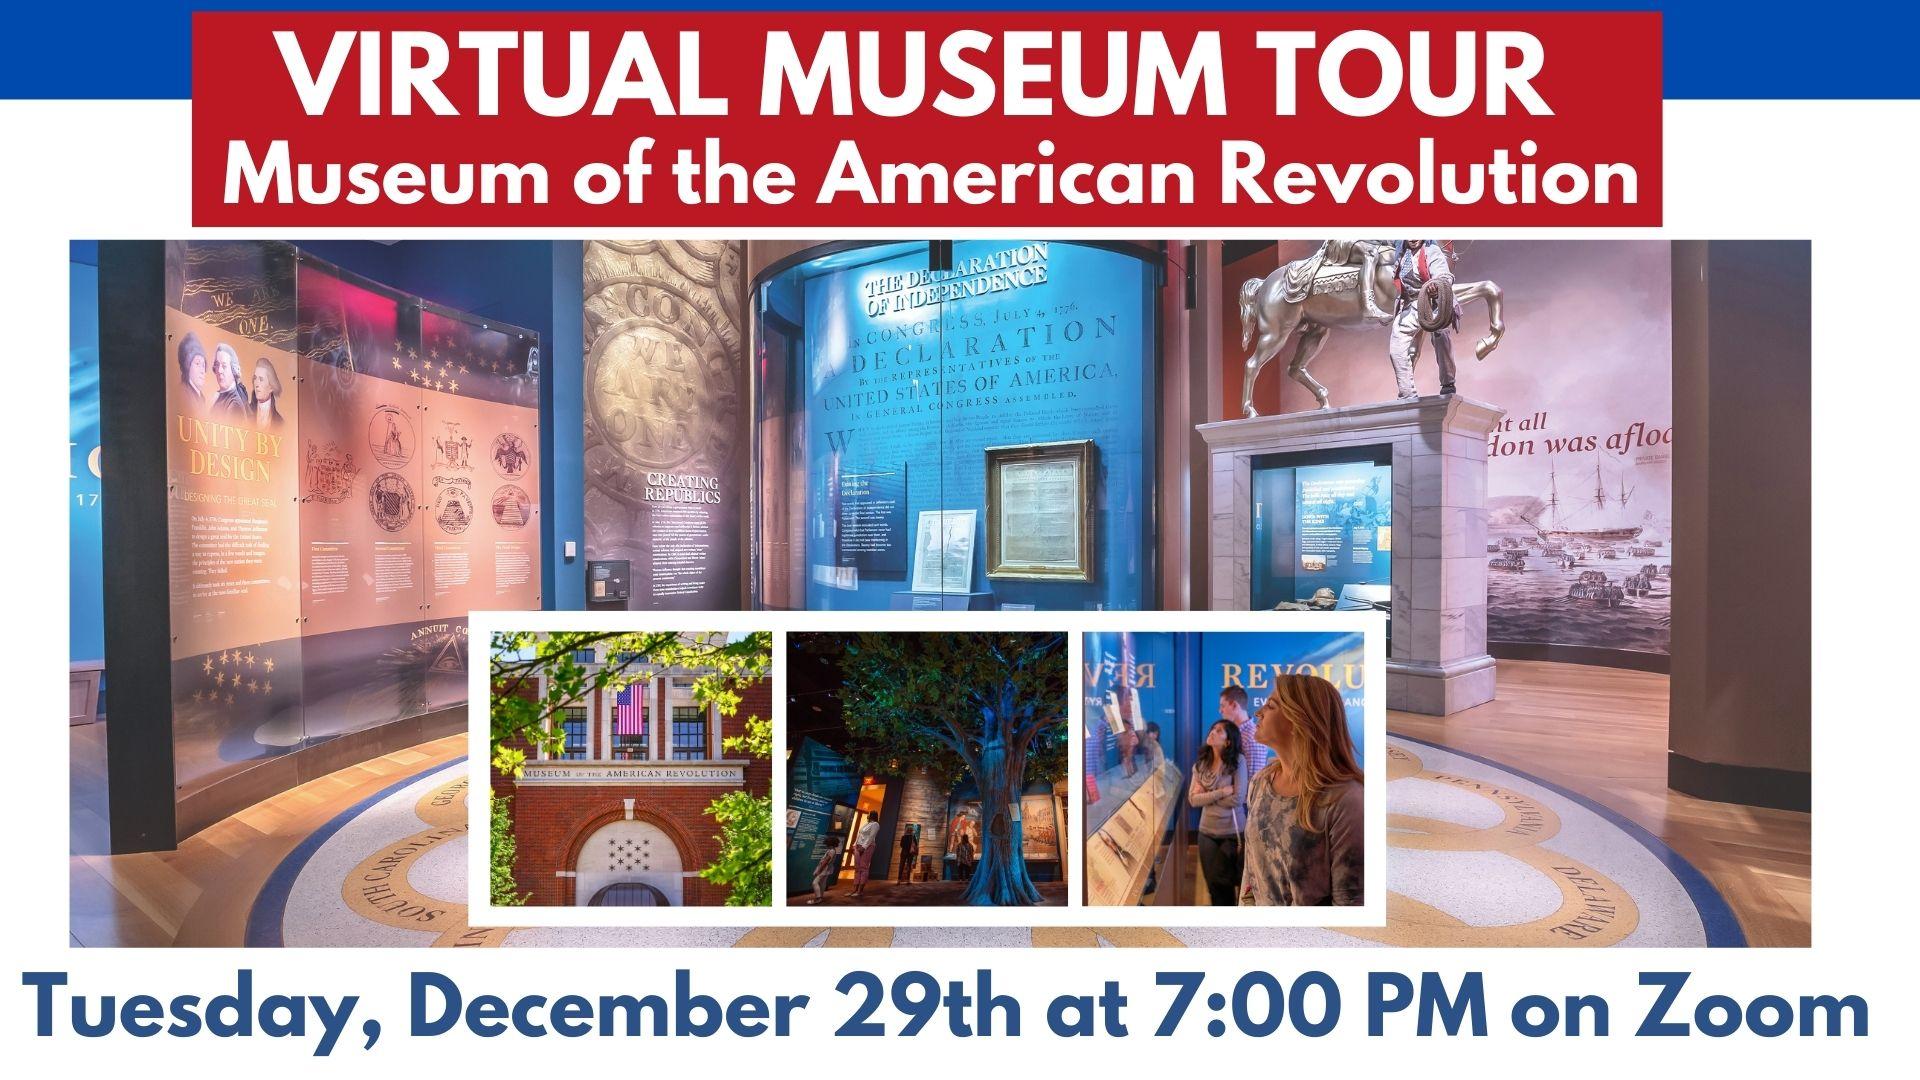 Virtual Museum Tour: Museum of the American Revolution